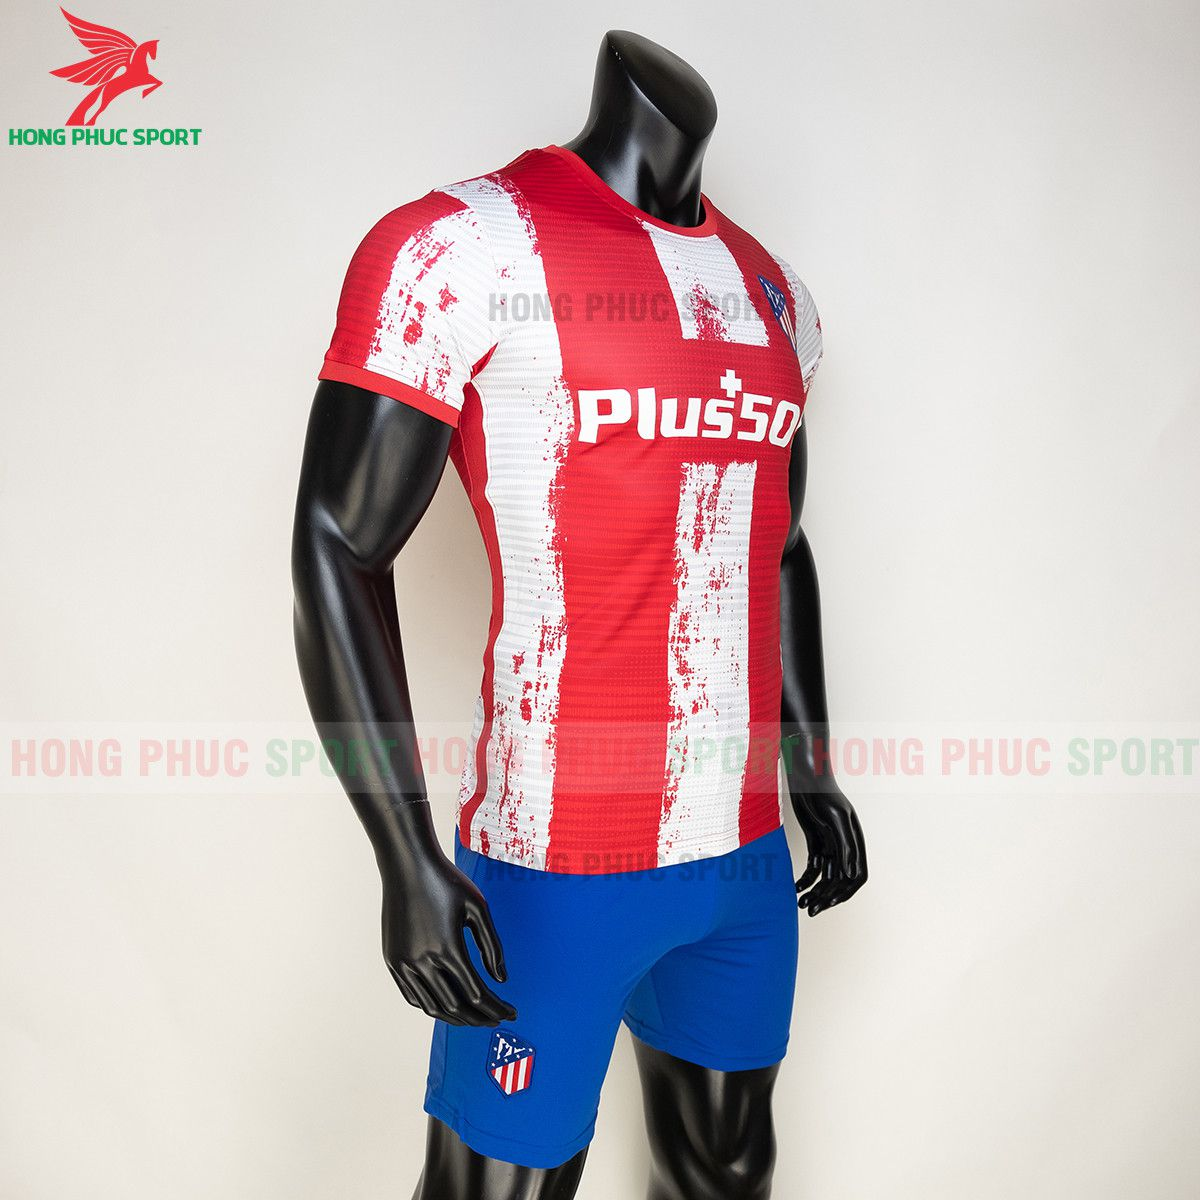 https://cdn.hongphucsport.com/unsafe/s4.shopbay.vn/files/285/ao-bong-da-atletico-madrid-2021-22-san-nha-thailand-4-61558e8c3768e.jpg